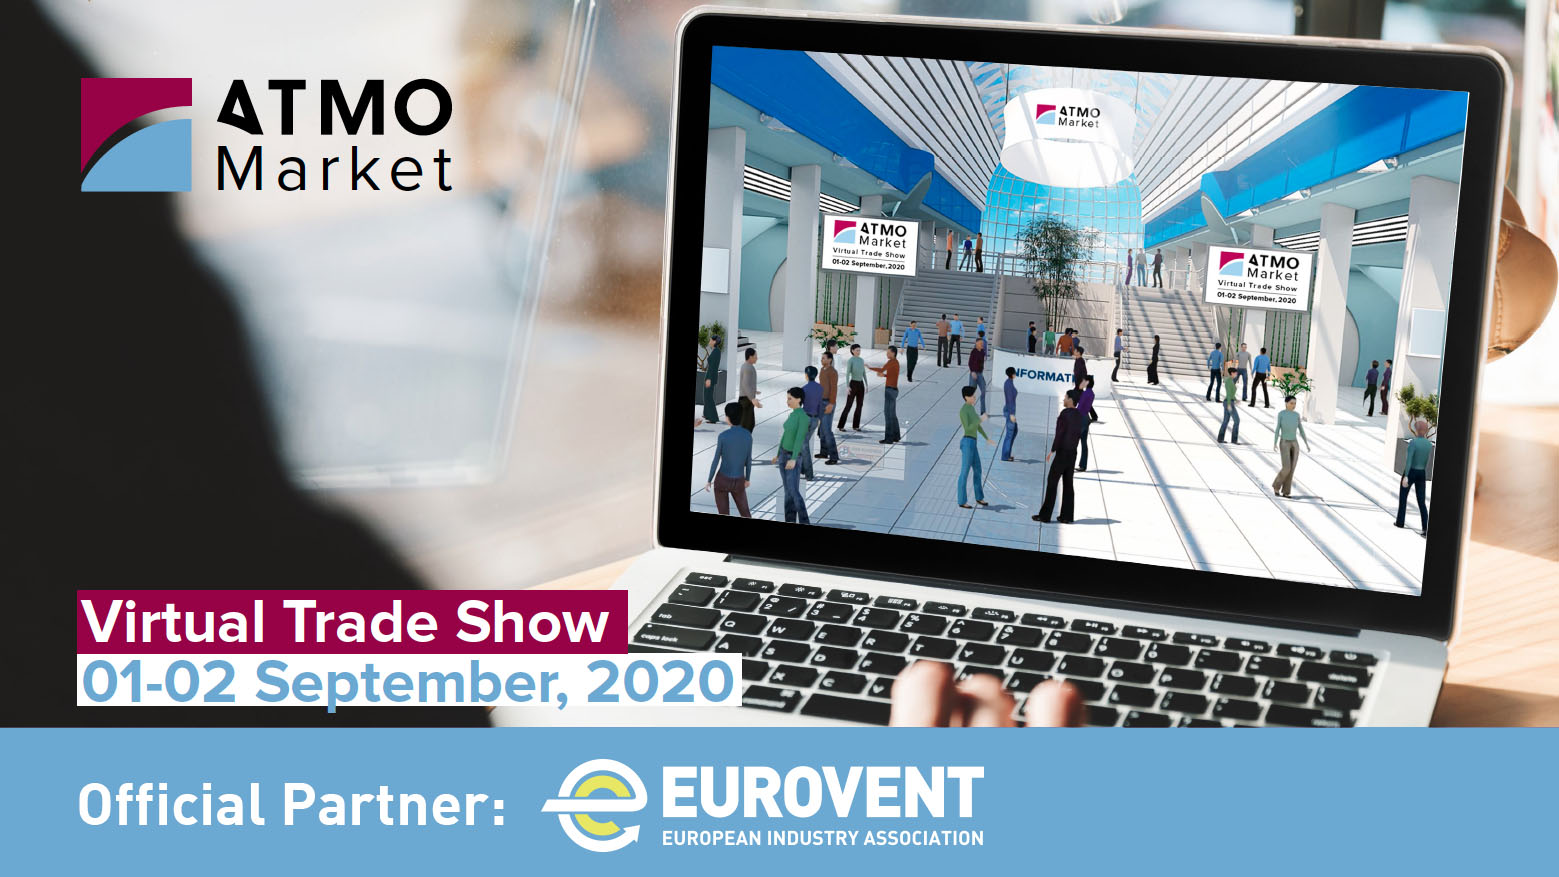 2020 - Eurovent joins shecco's Virtual Trade Show